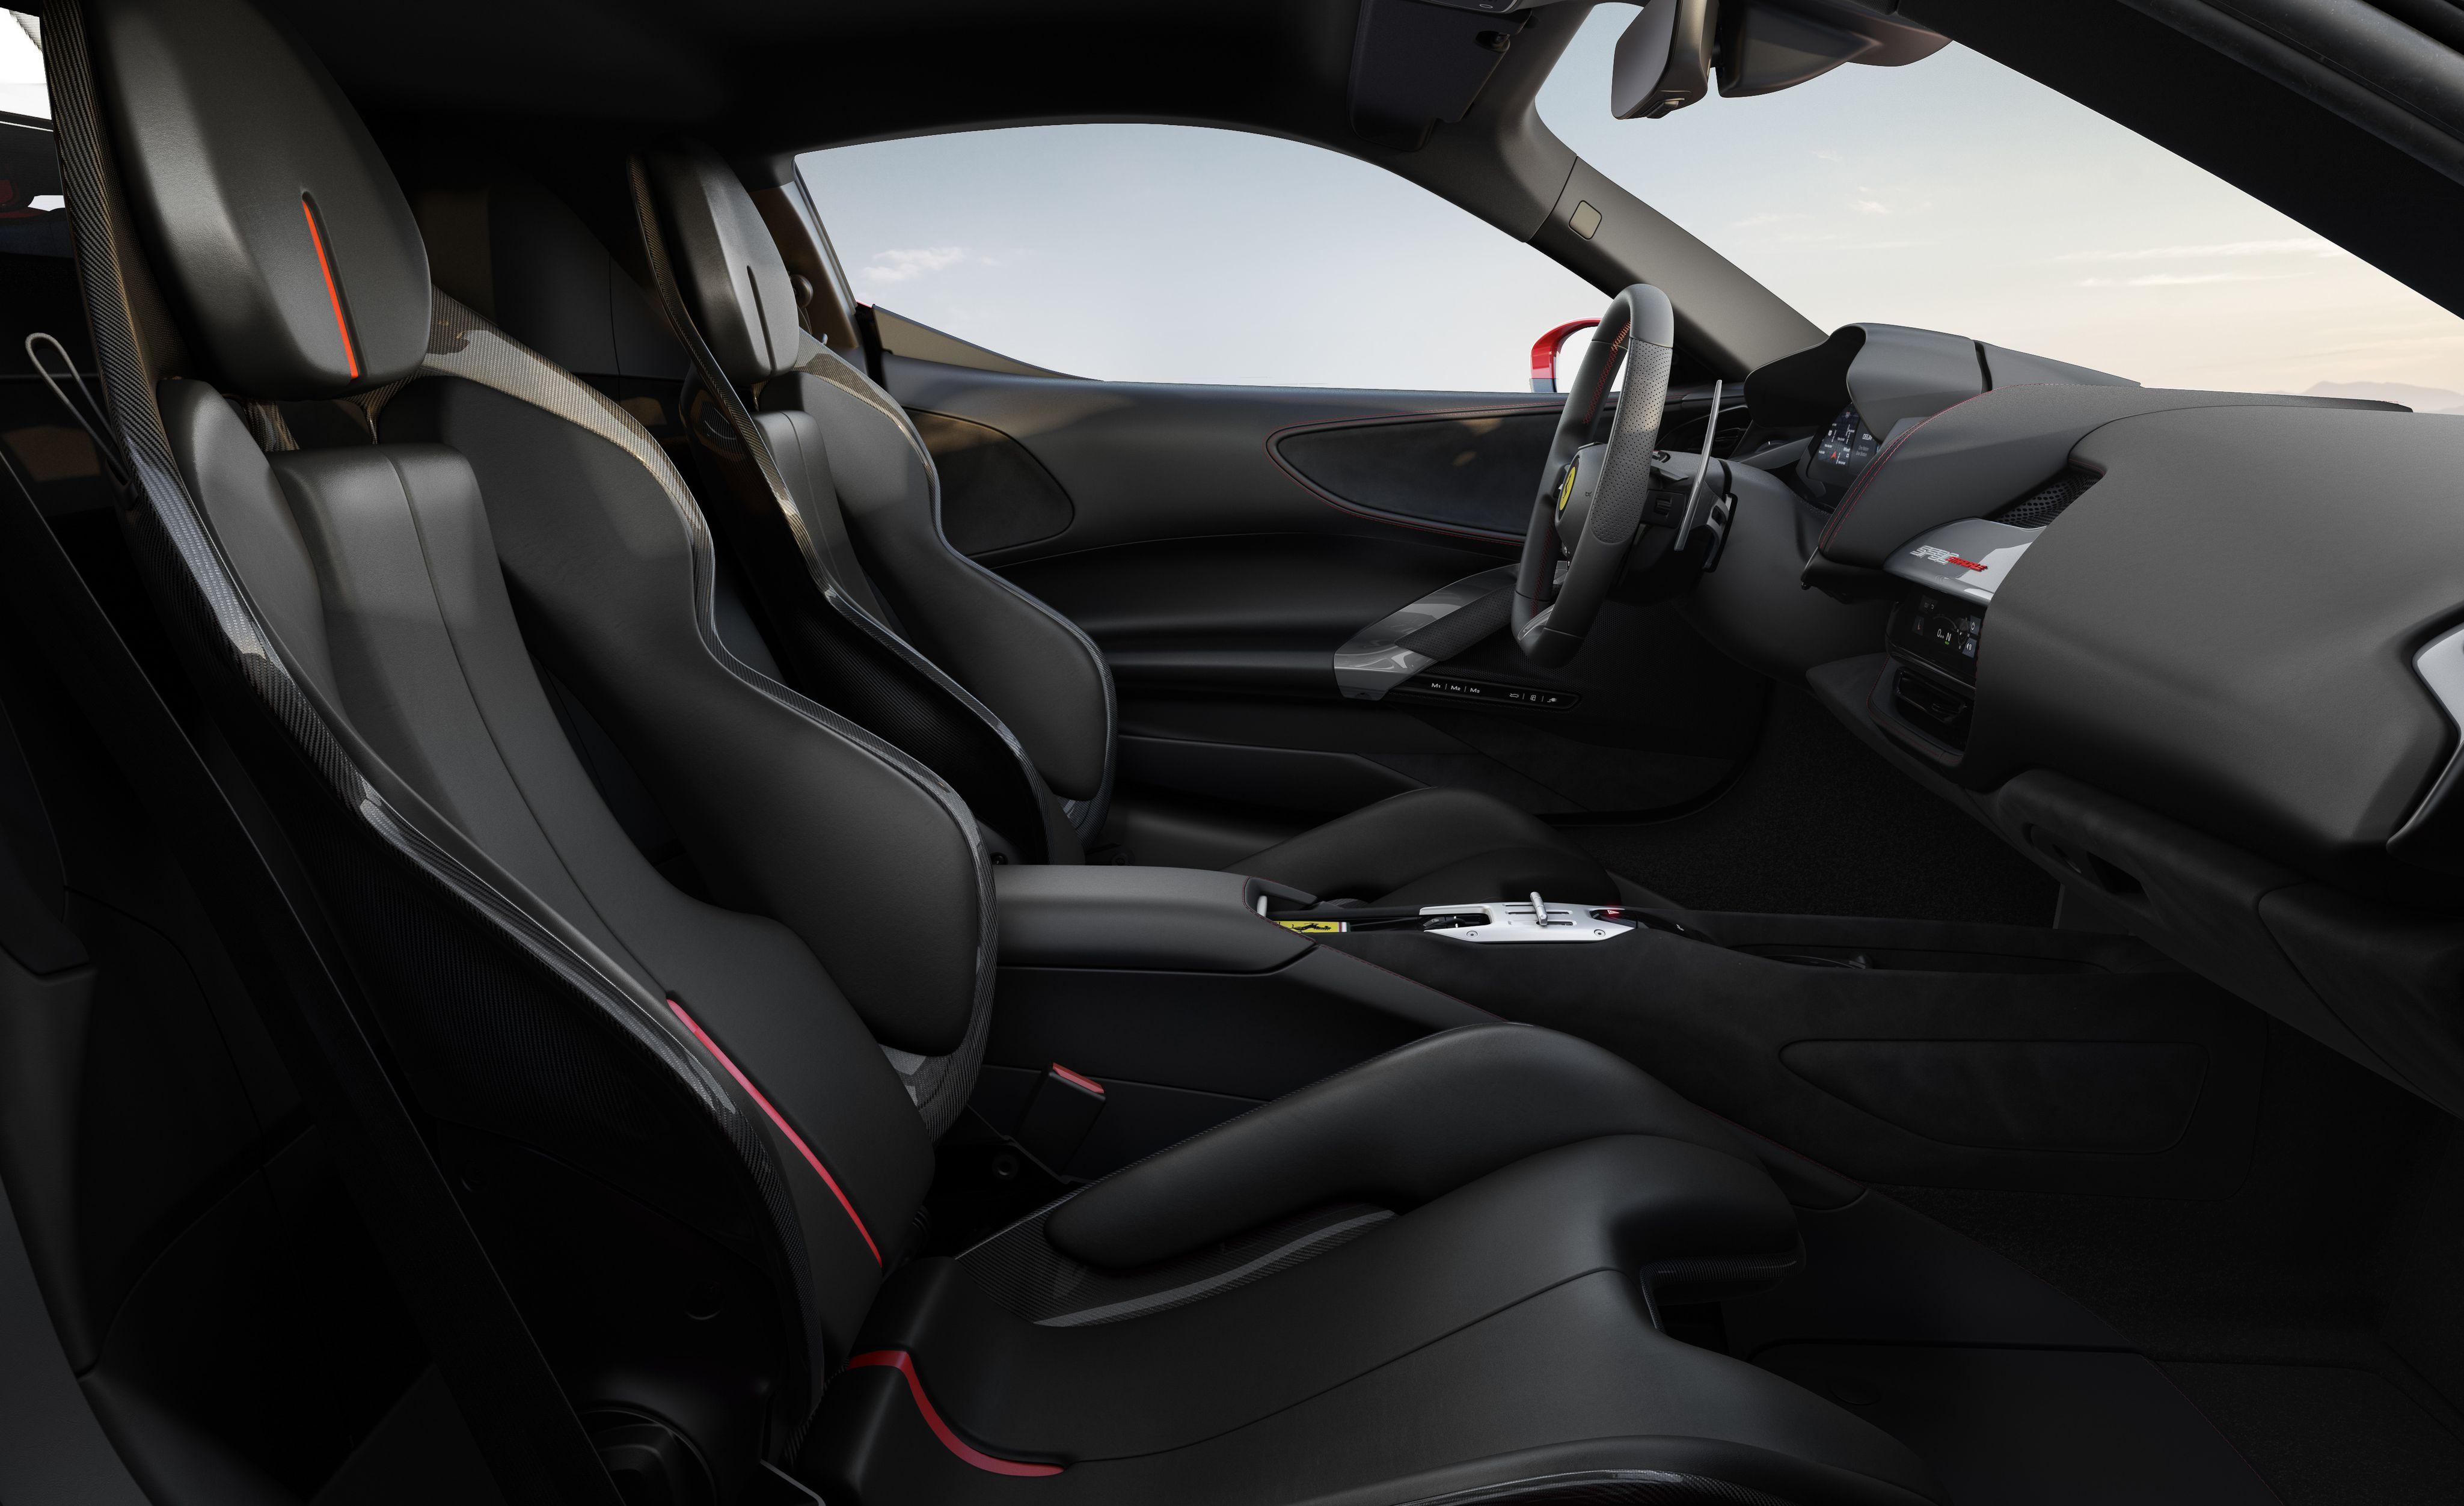 View Photos of the New Ferrari SF90 Stradale #newferrari